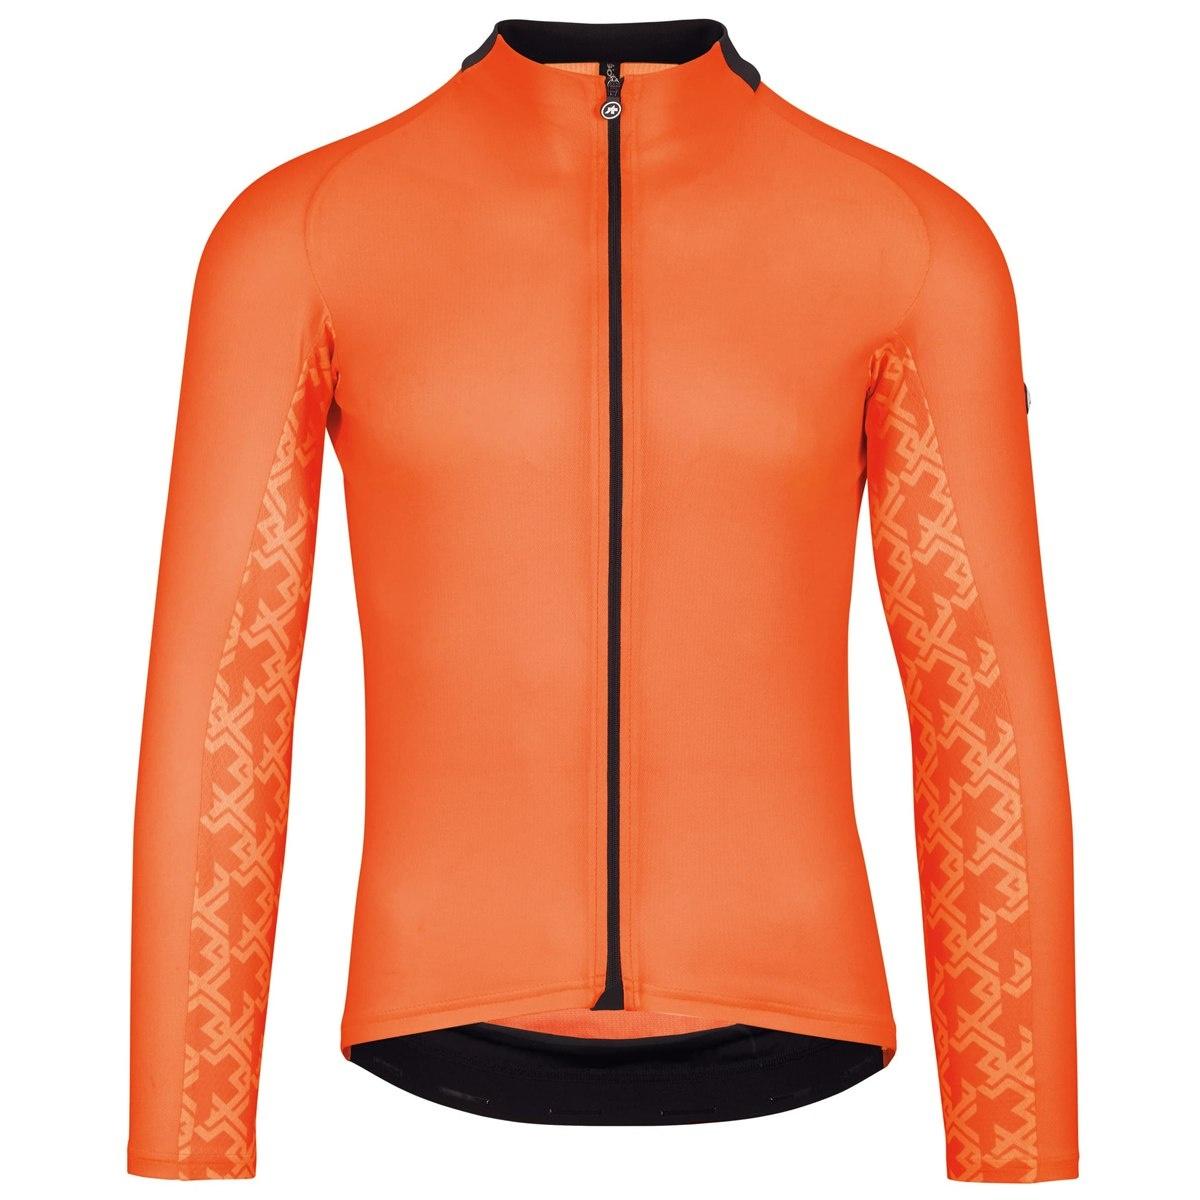 Grip Grab Knee Warmer Cykel Tilbehør||> Cykeltøj||> Grip Grab||Cykeltøj||Cykelbeklædning